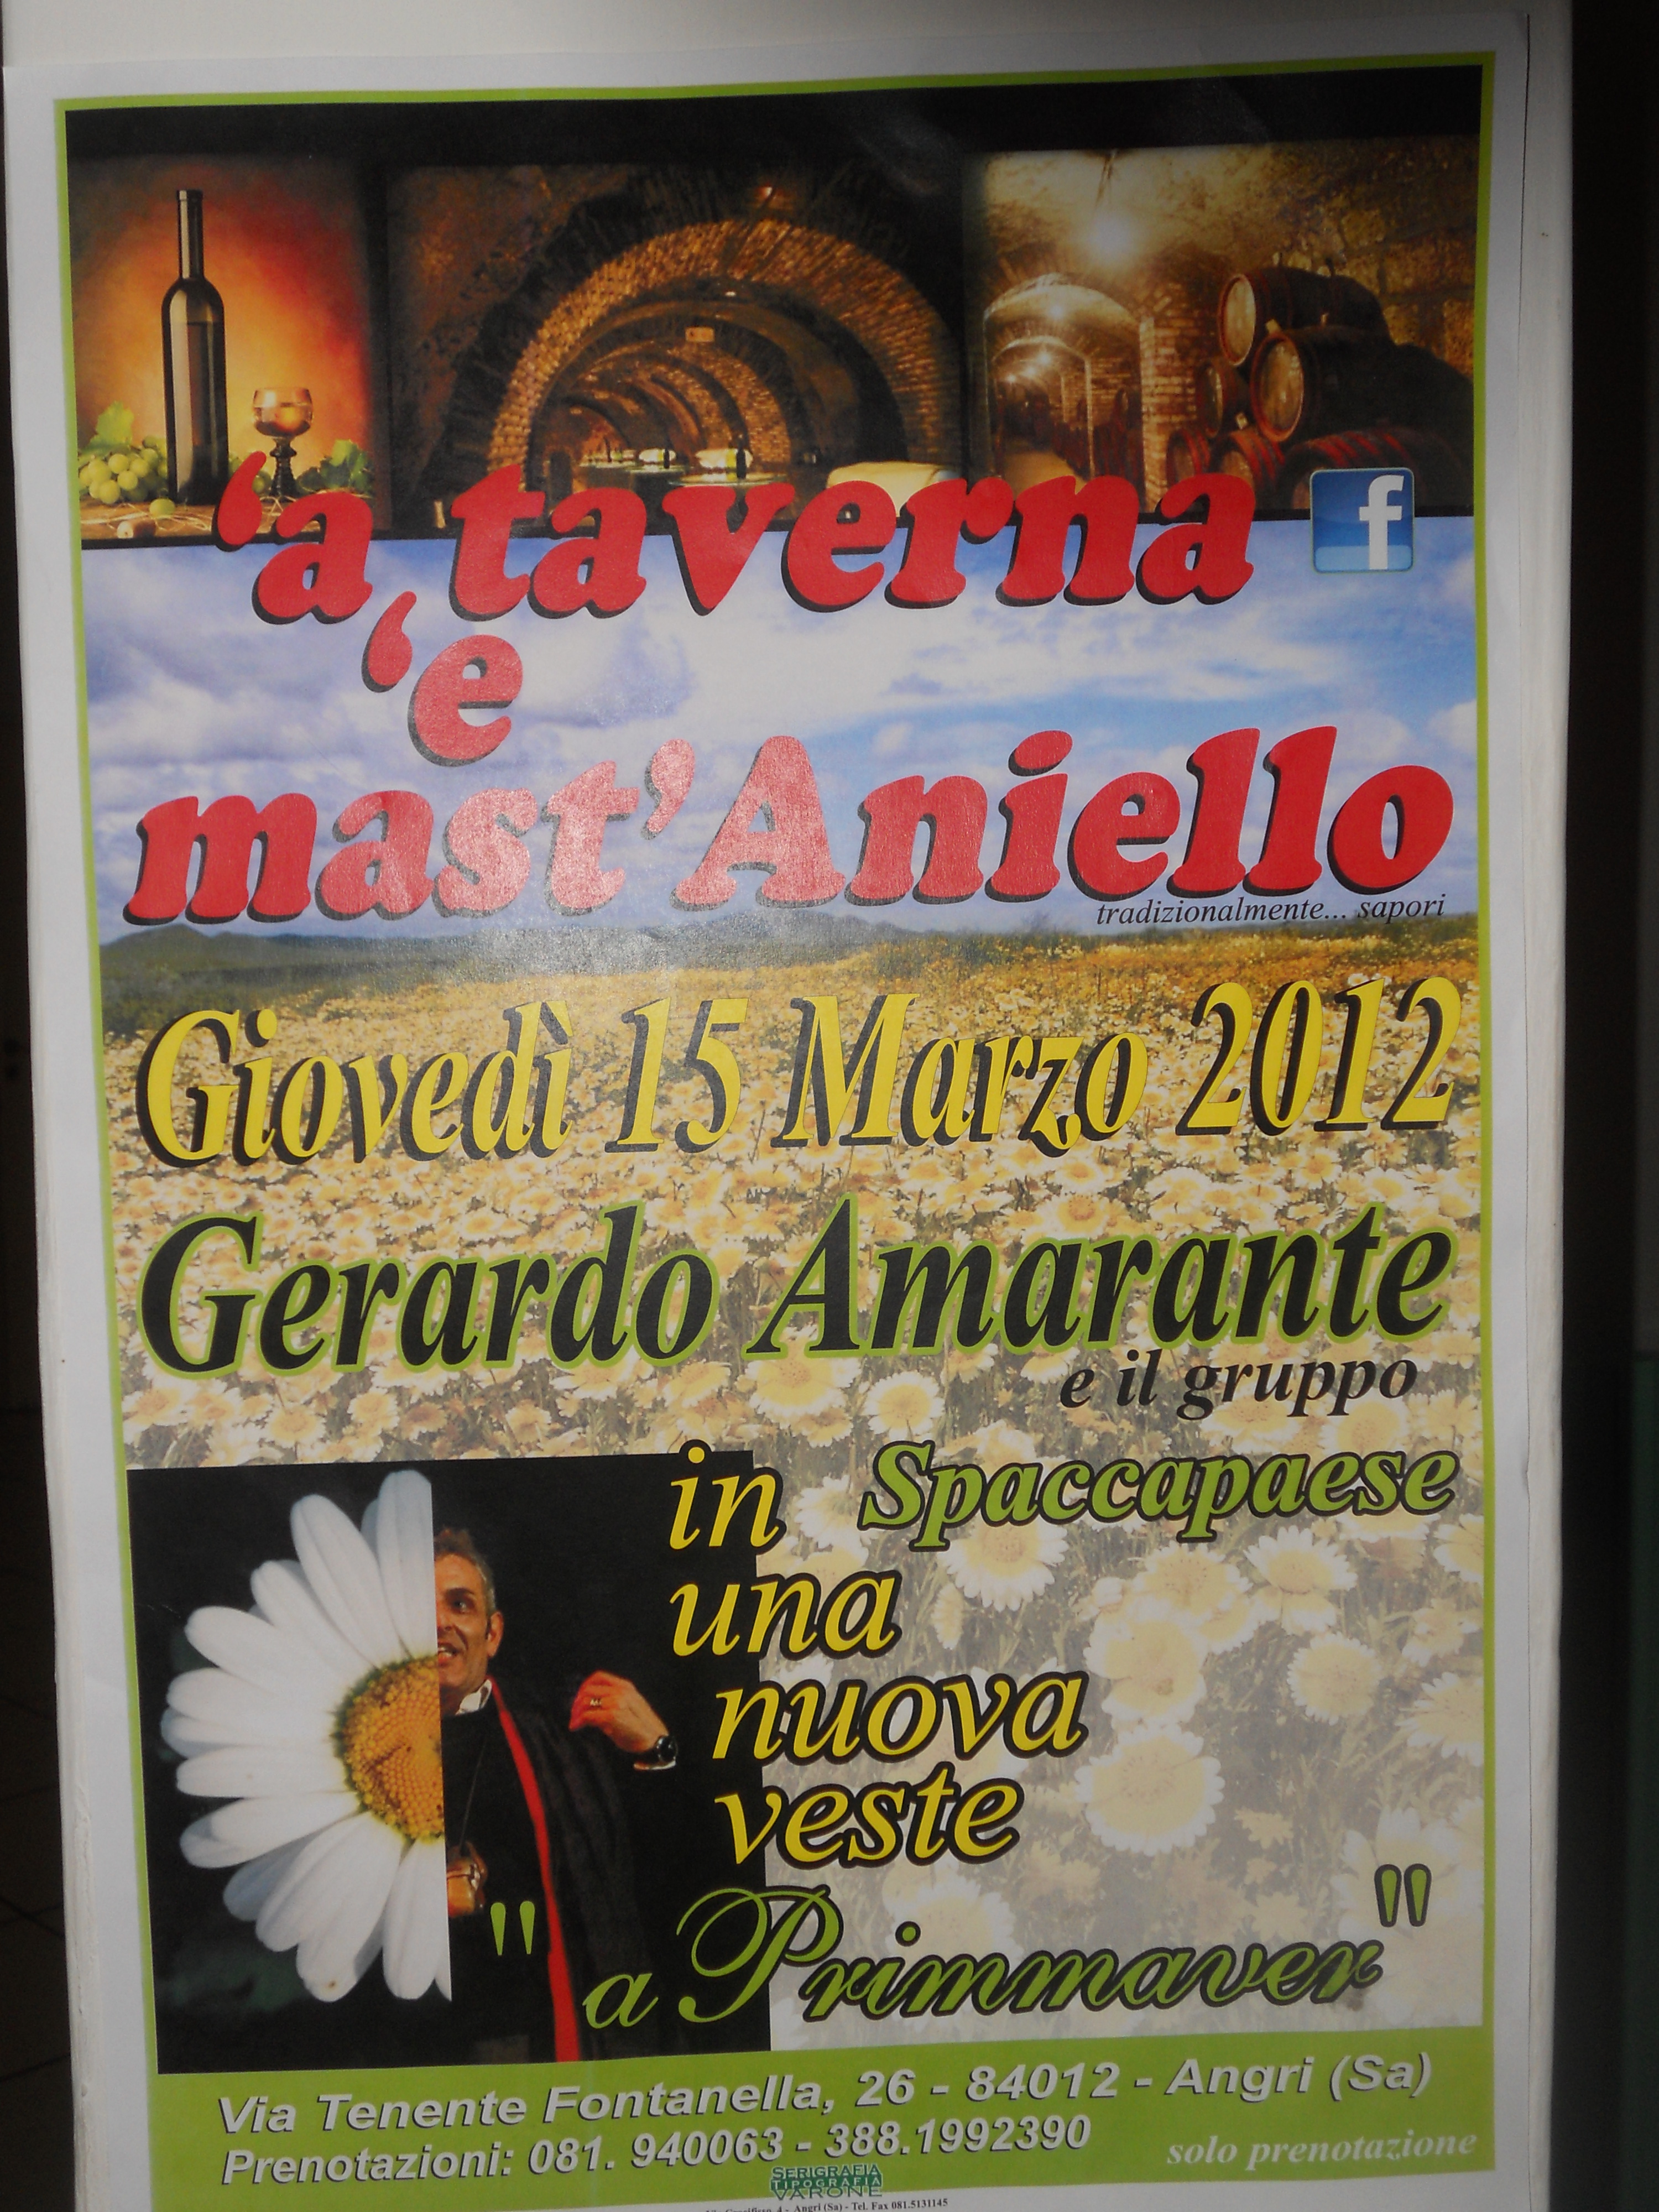 SPACCAPAESE - GERARDO AMARANTE cena-spettacolo